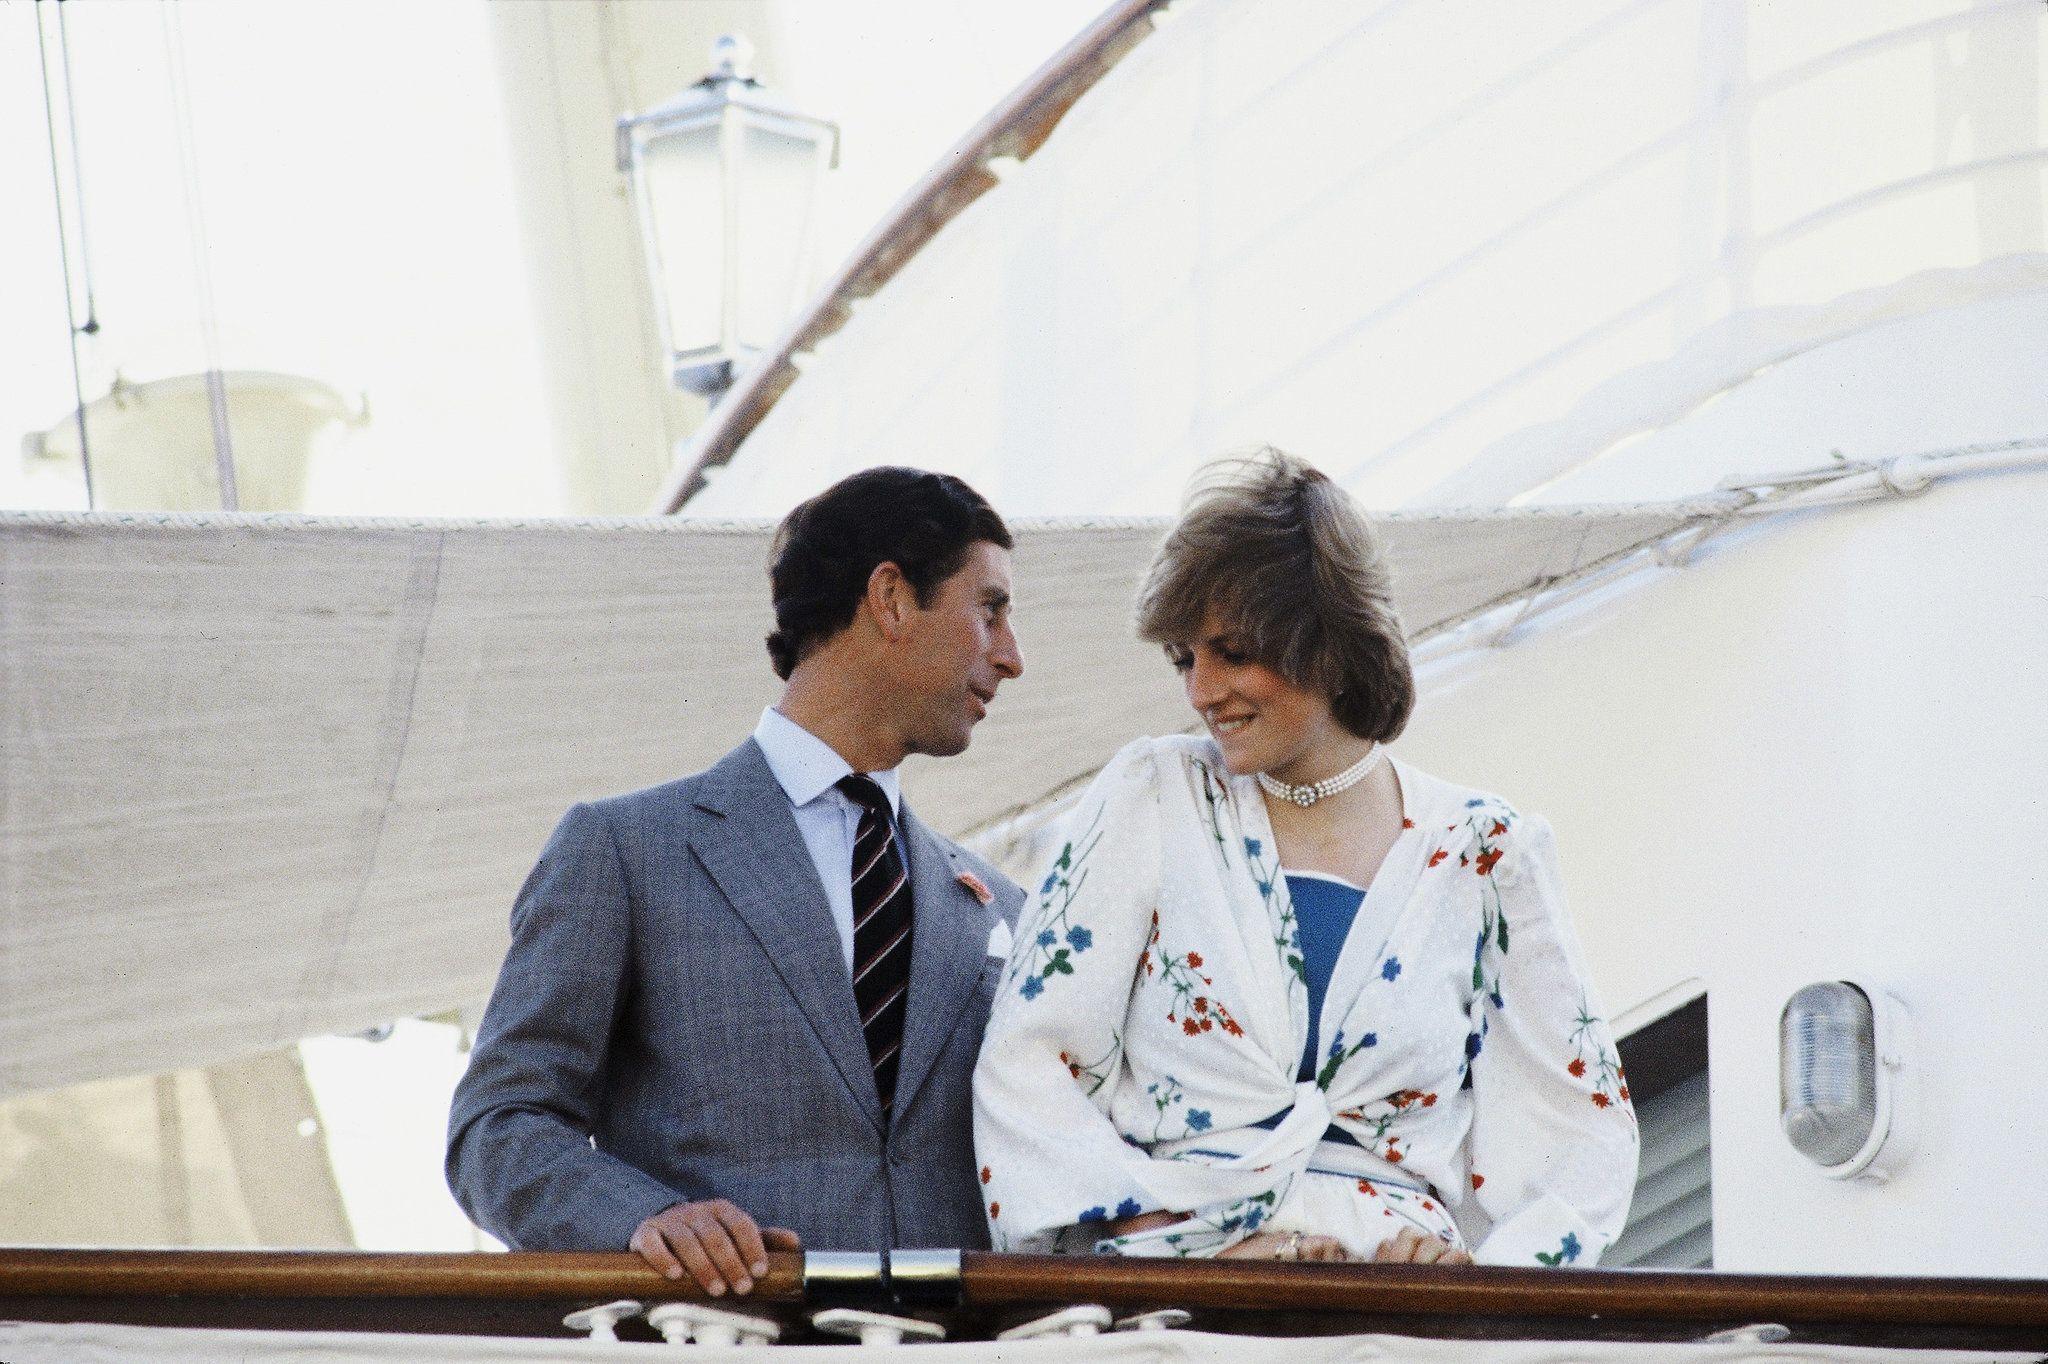 Charles and Diana took their honeymoon on Queen Elizabeth II's royal yacht, the Britannia.